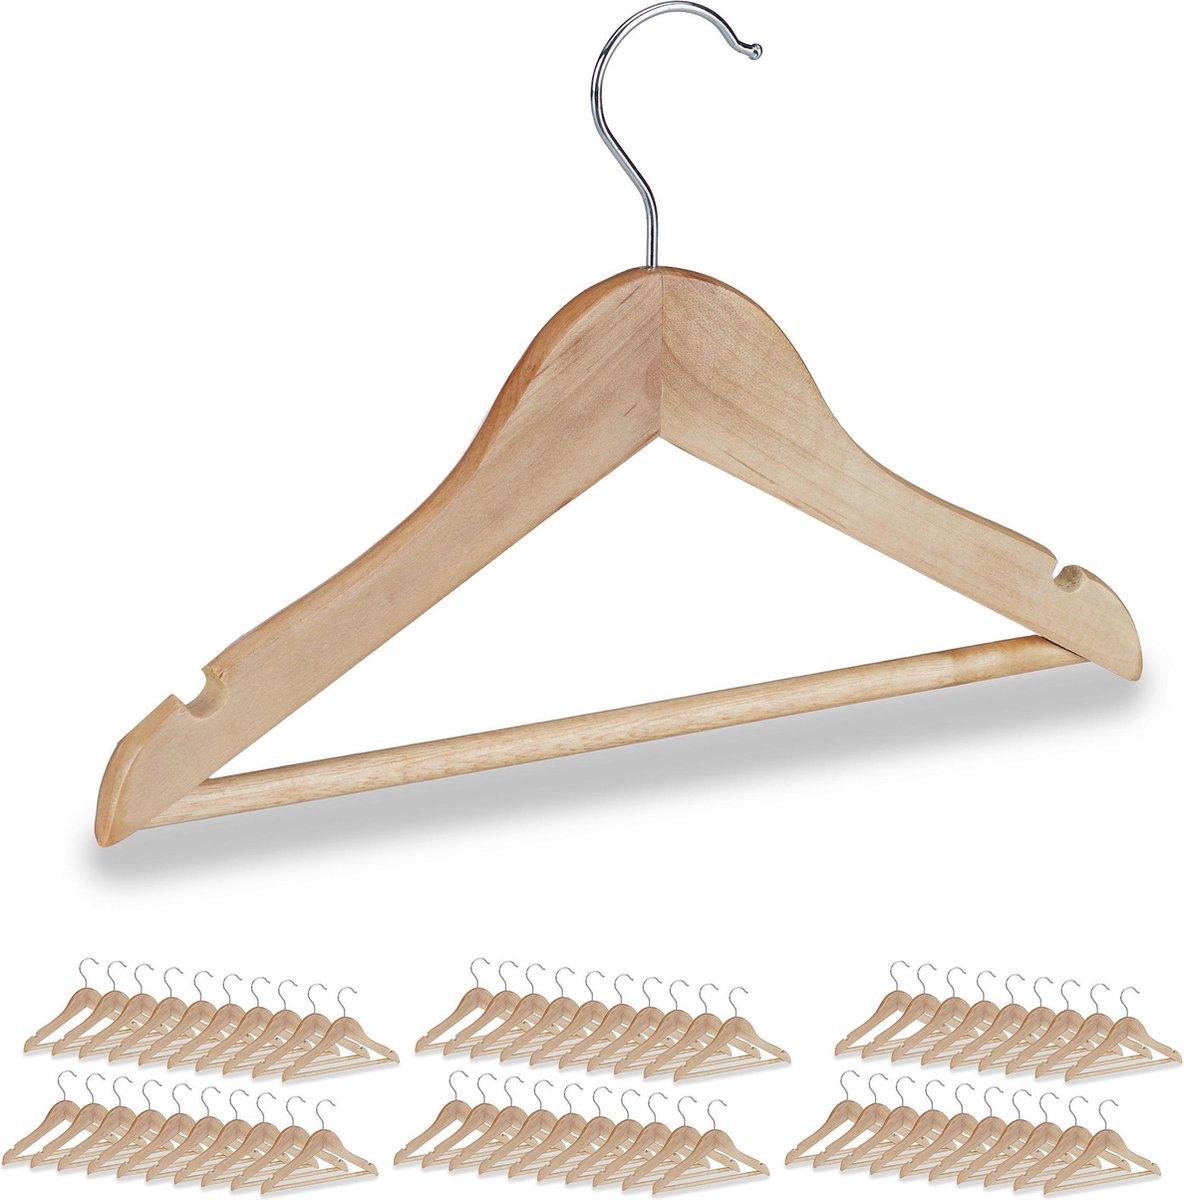 relaxdays 4x kinderkledinghanger - kledinghangers hout - set - broeklat -  draaibare haak